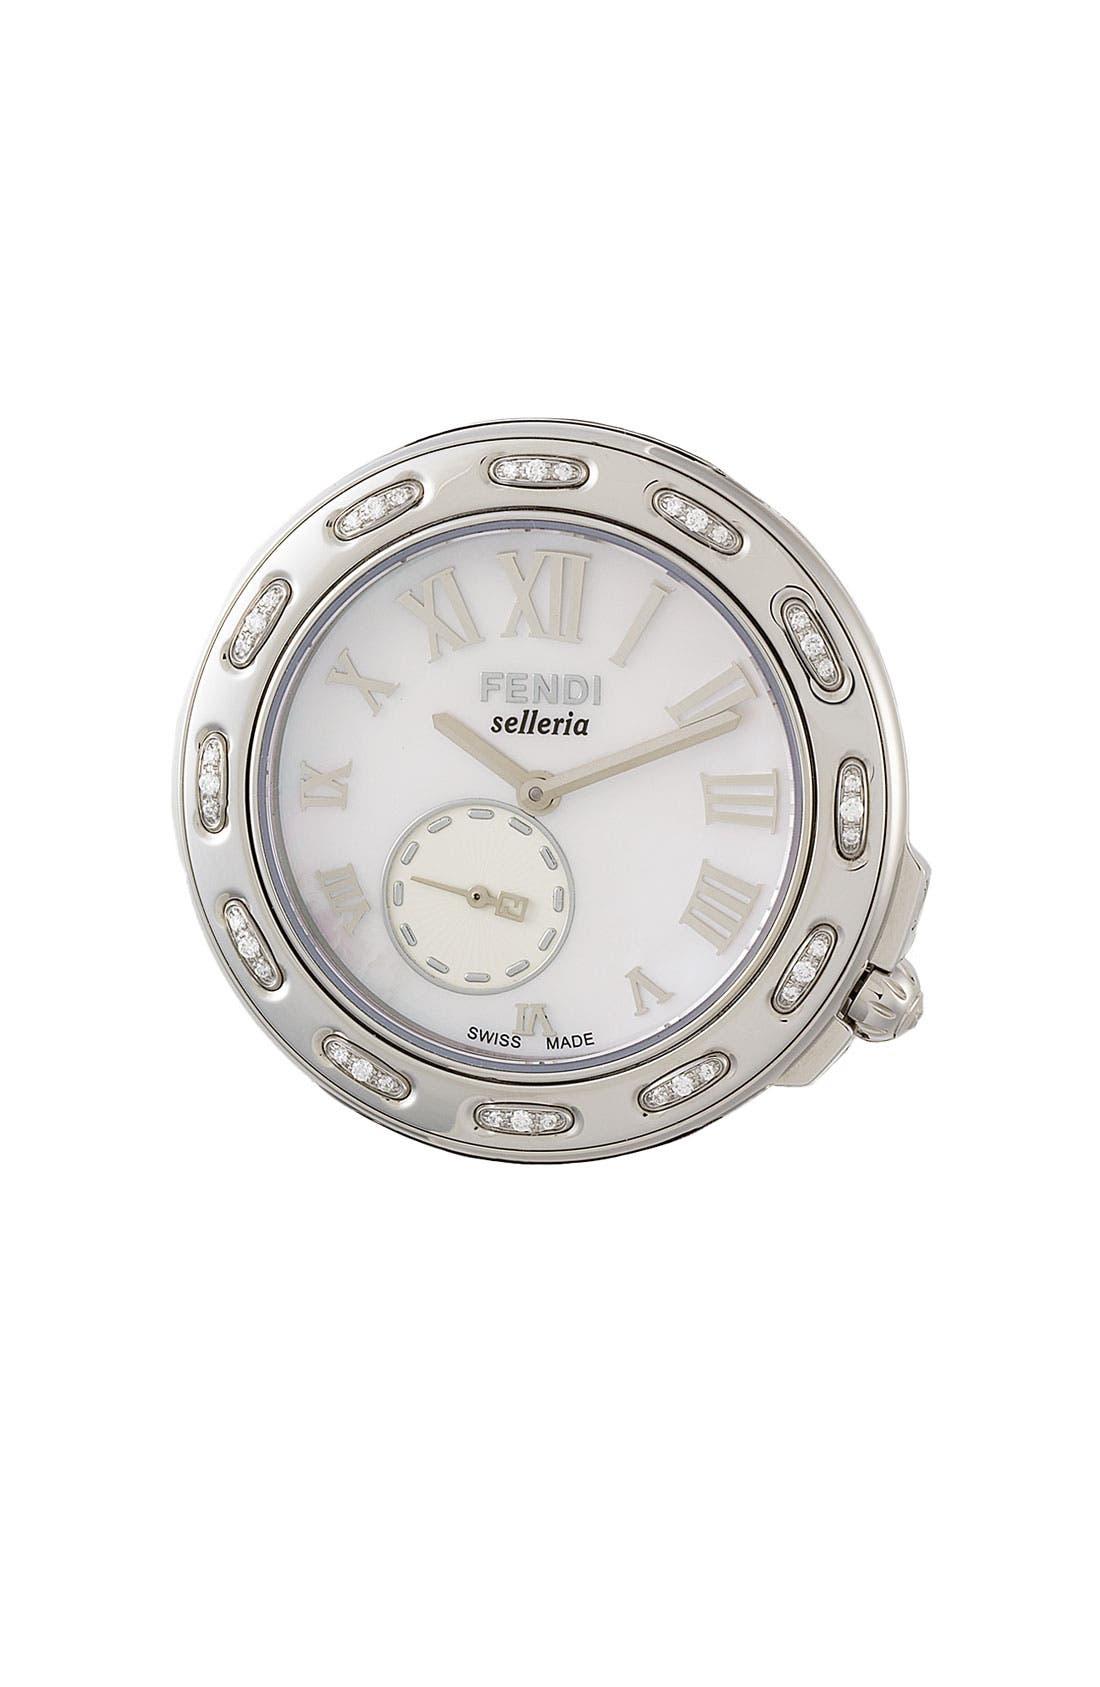 Main Image - Fendi 'Selleria' Diamond Watch Case